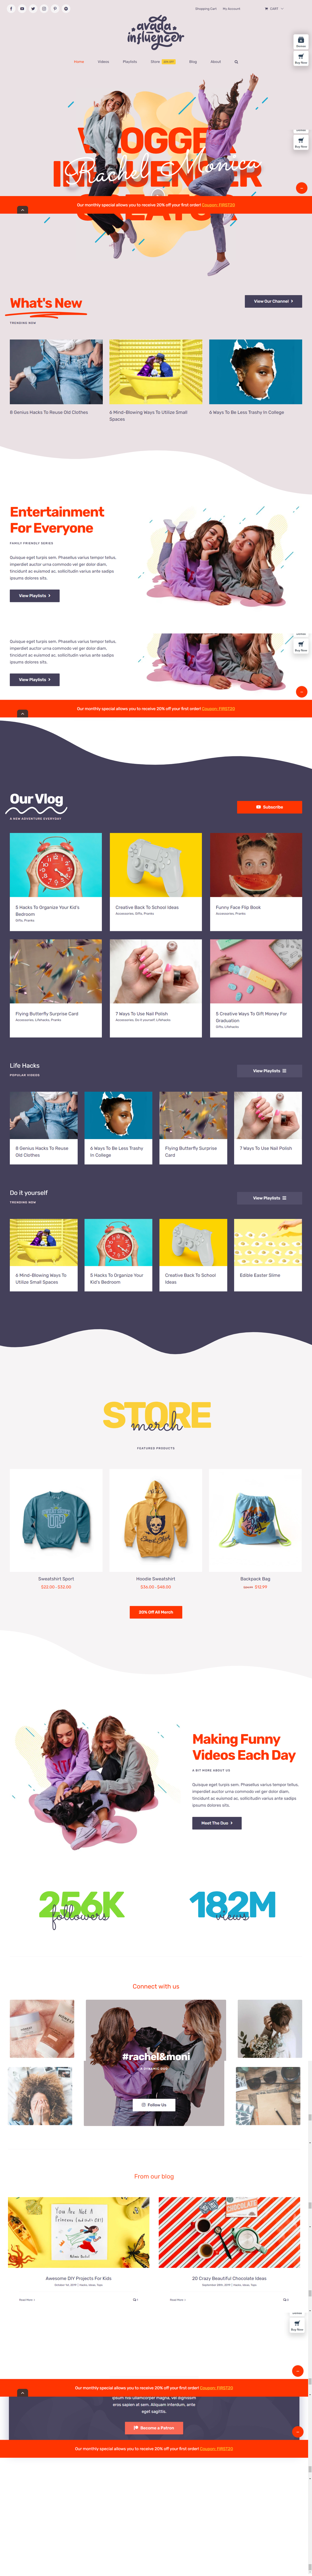 Avada Website Builder For Wordpress Woocommerce Professional Web Design Web Design Web Design Agency